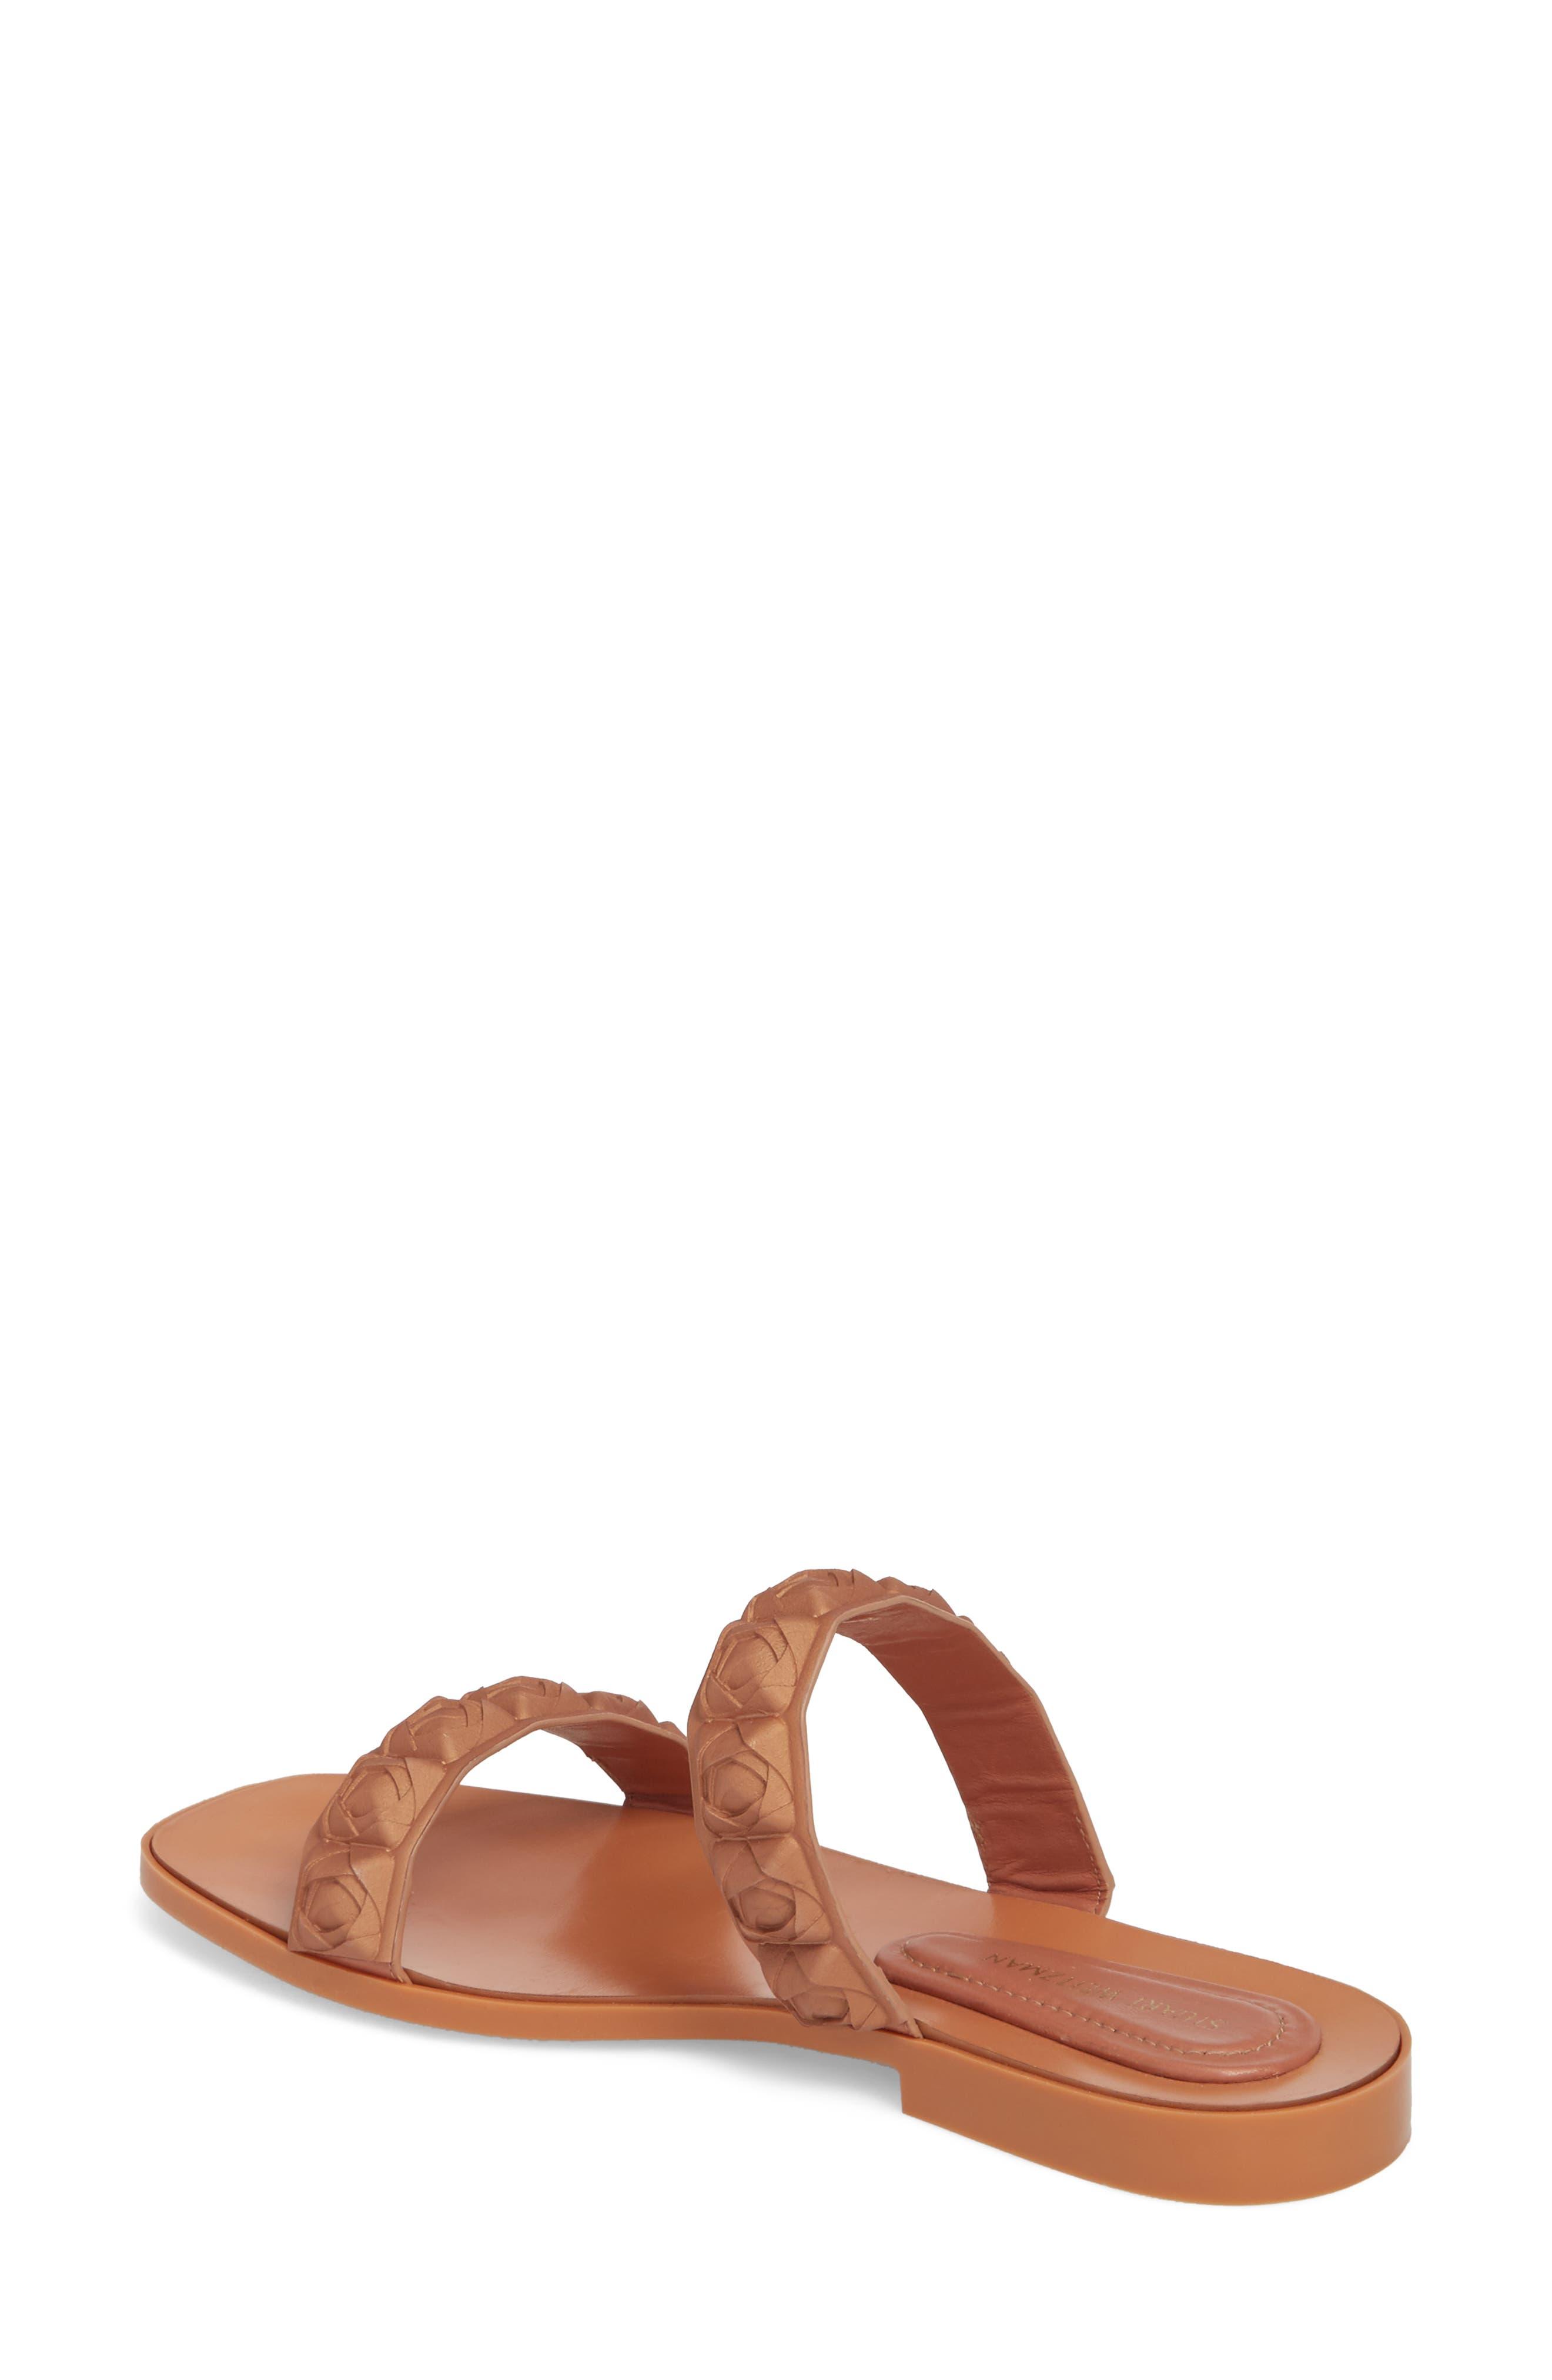 Rosita Dual Strap Slide Sandal,                             Alternate thumbnail 9, color,